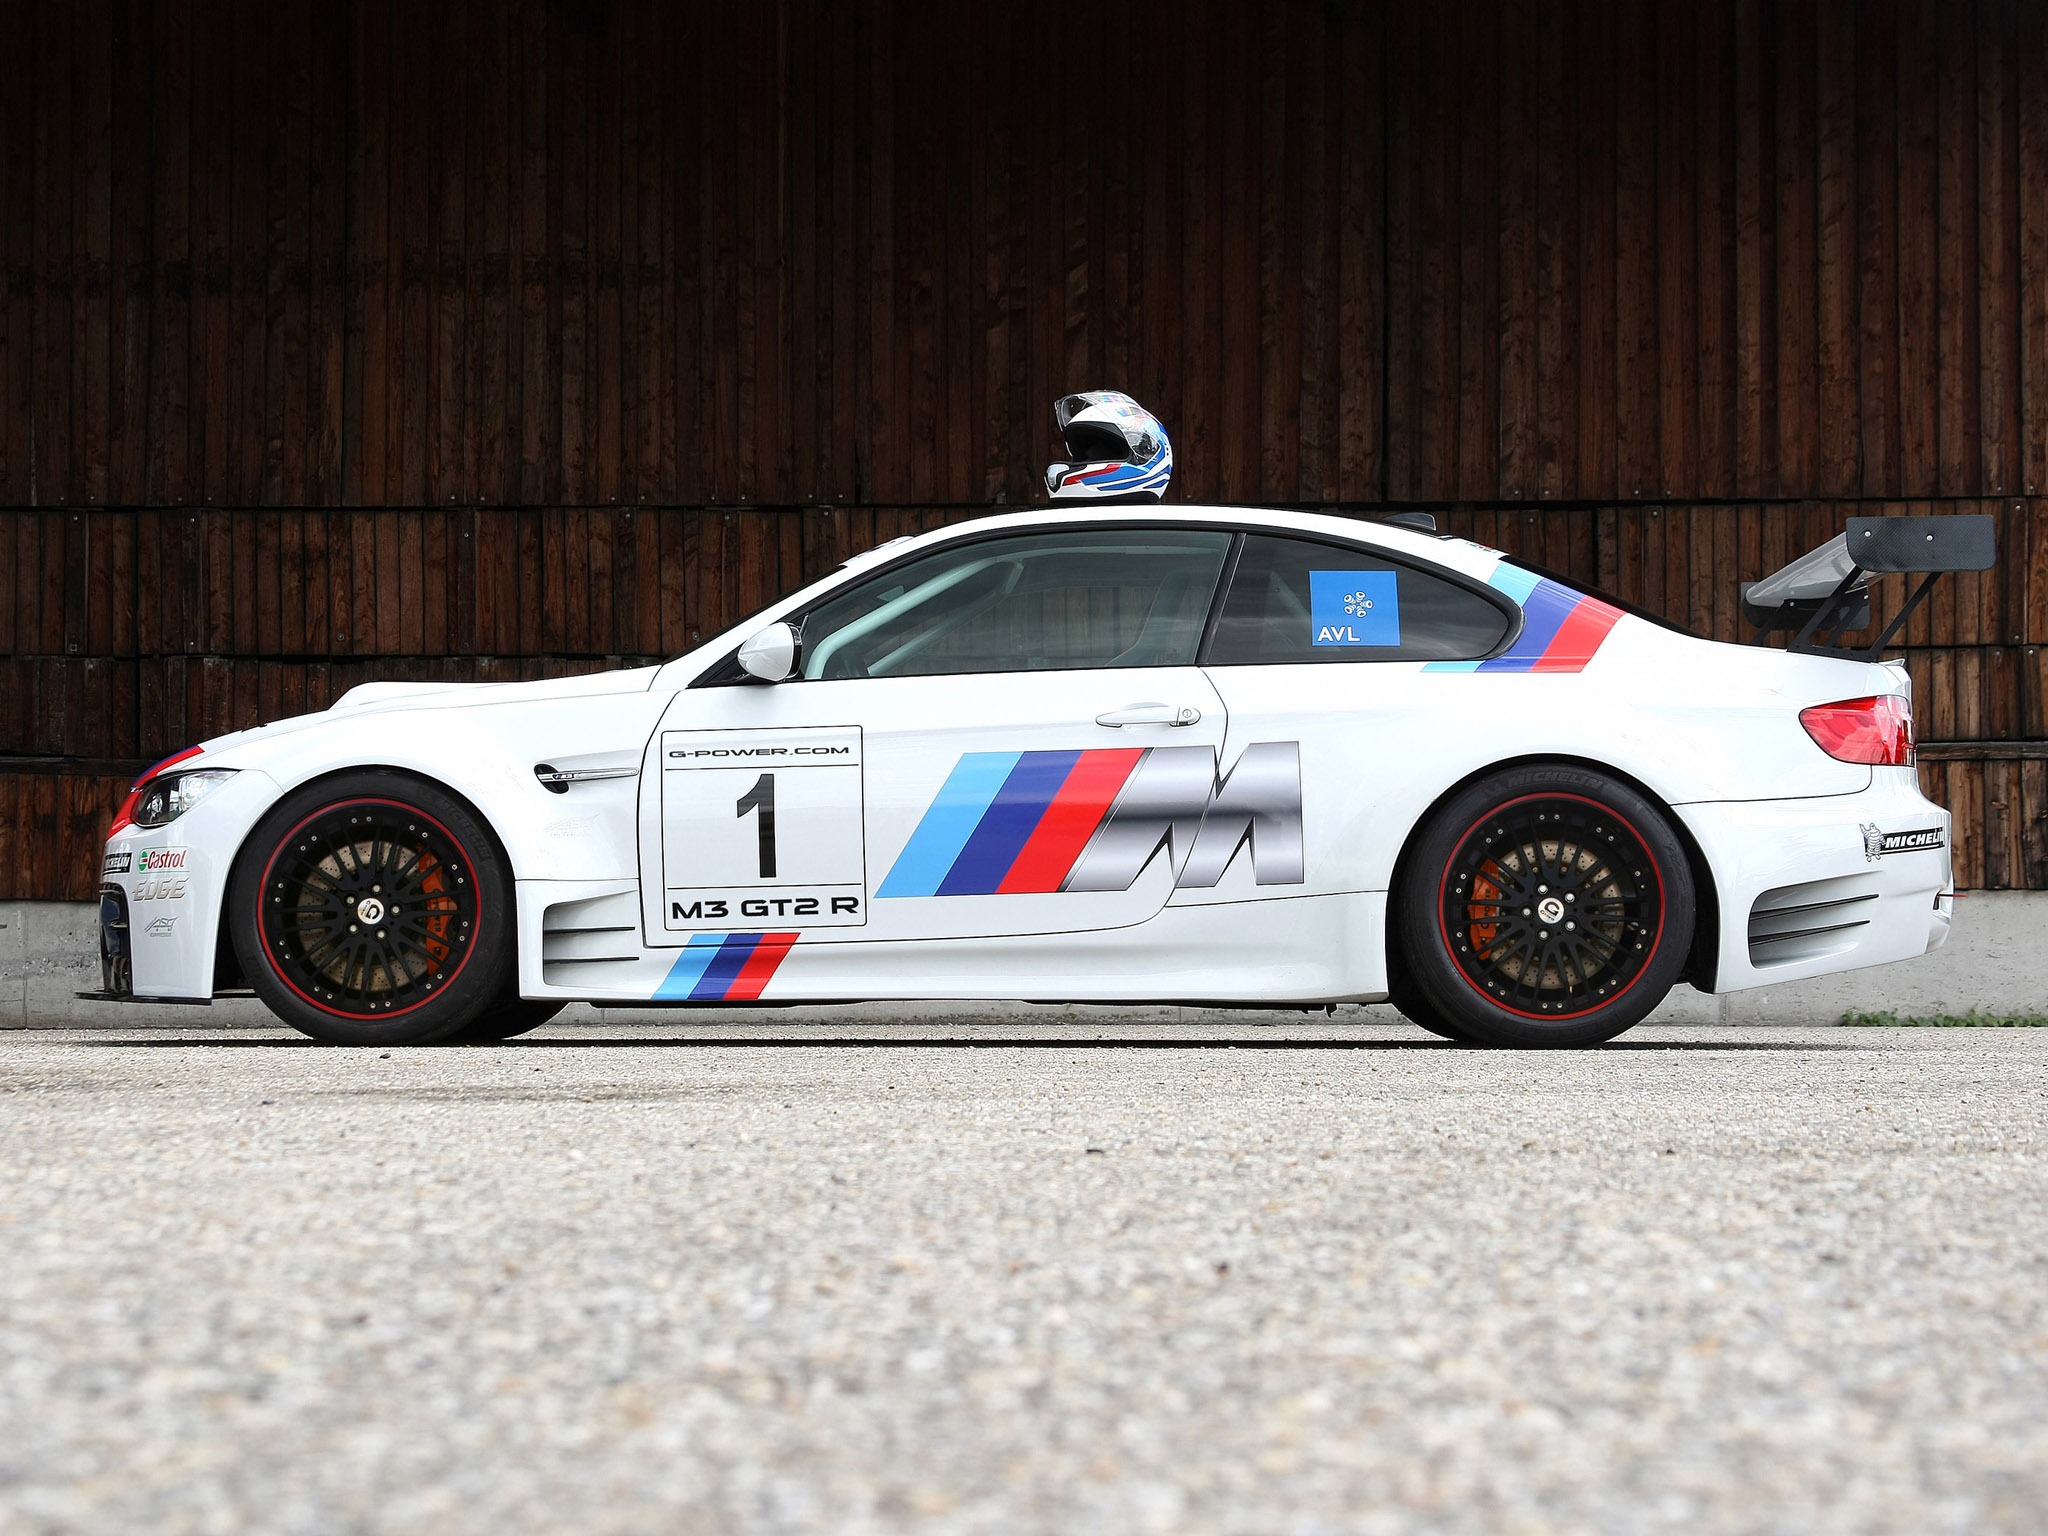 BMW M3 GT2-R E92 - 2048x1536